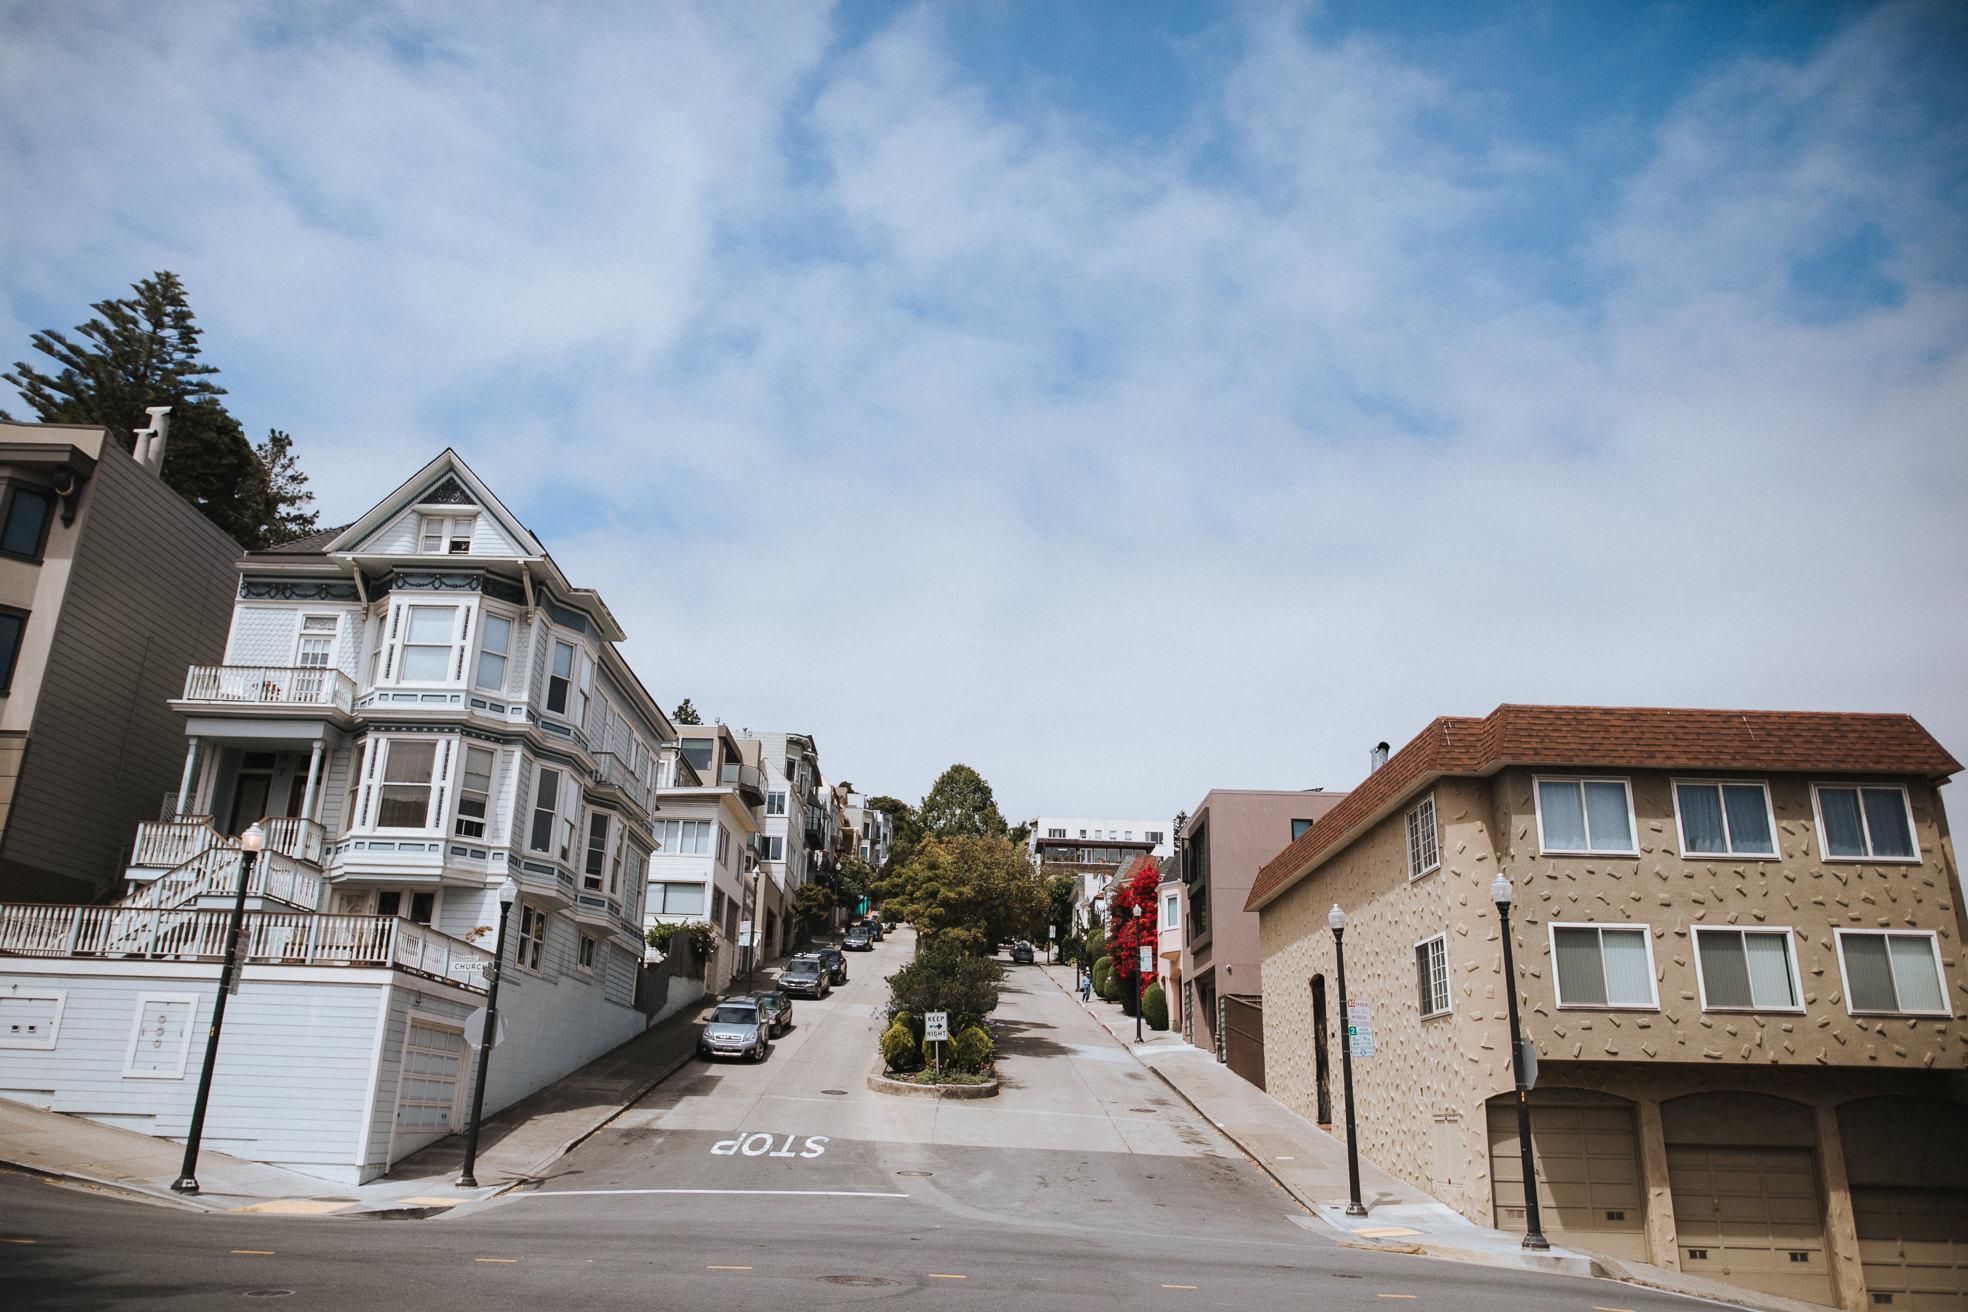 San-Francisco-BildervomLeben-4933